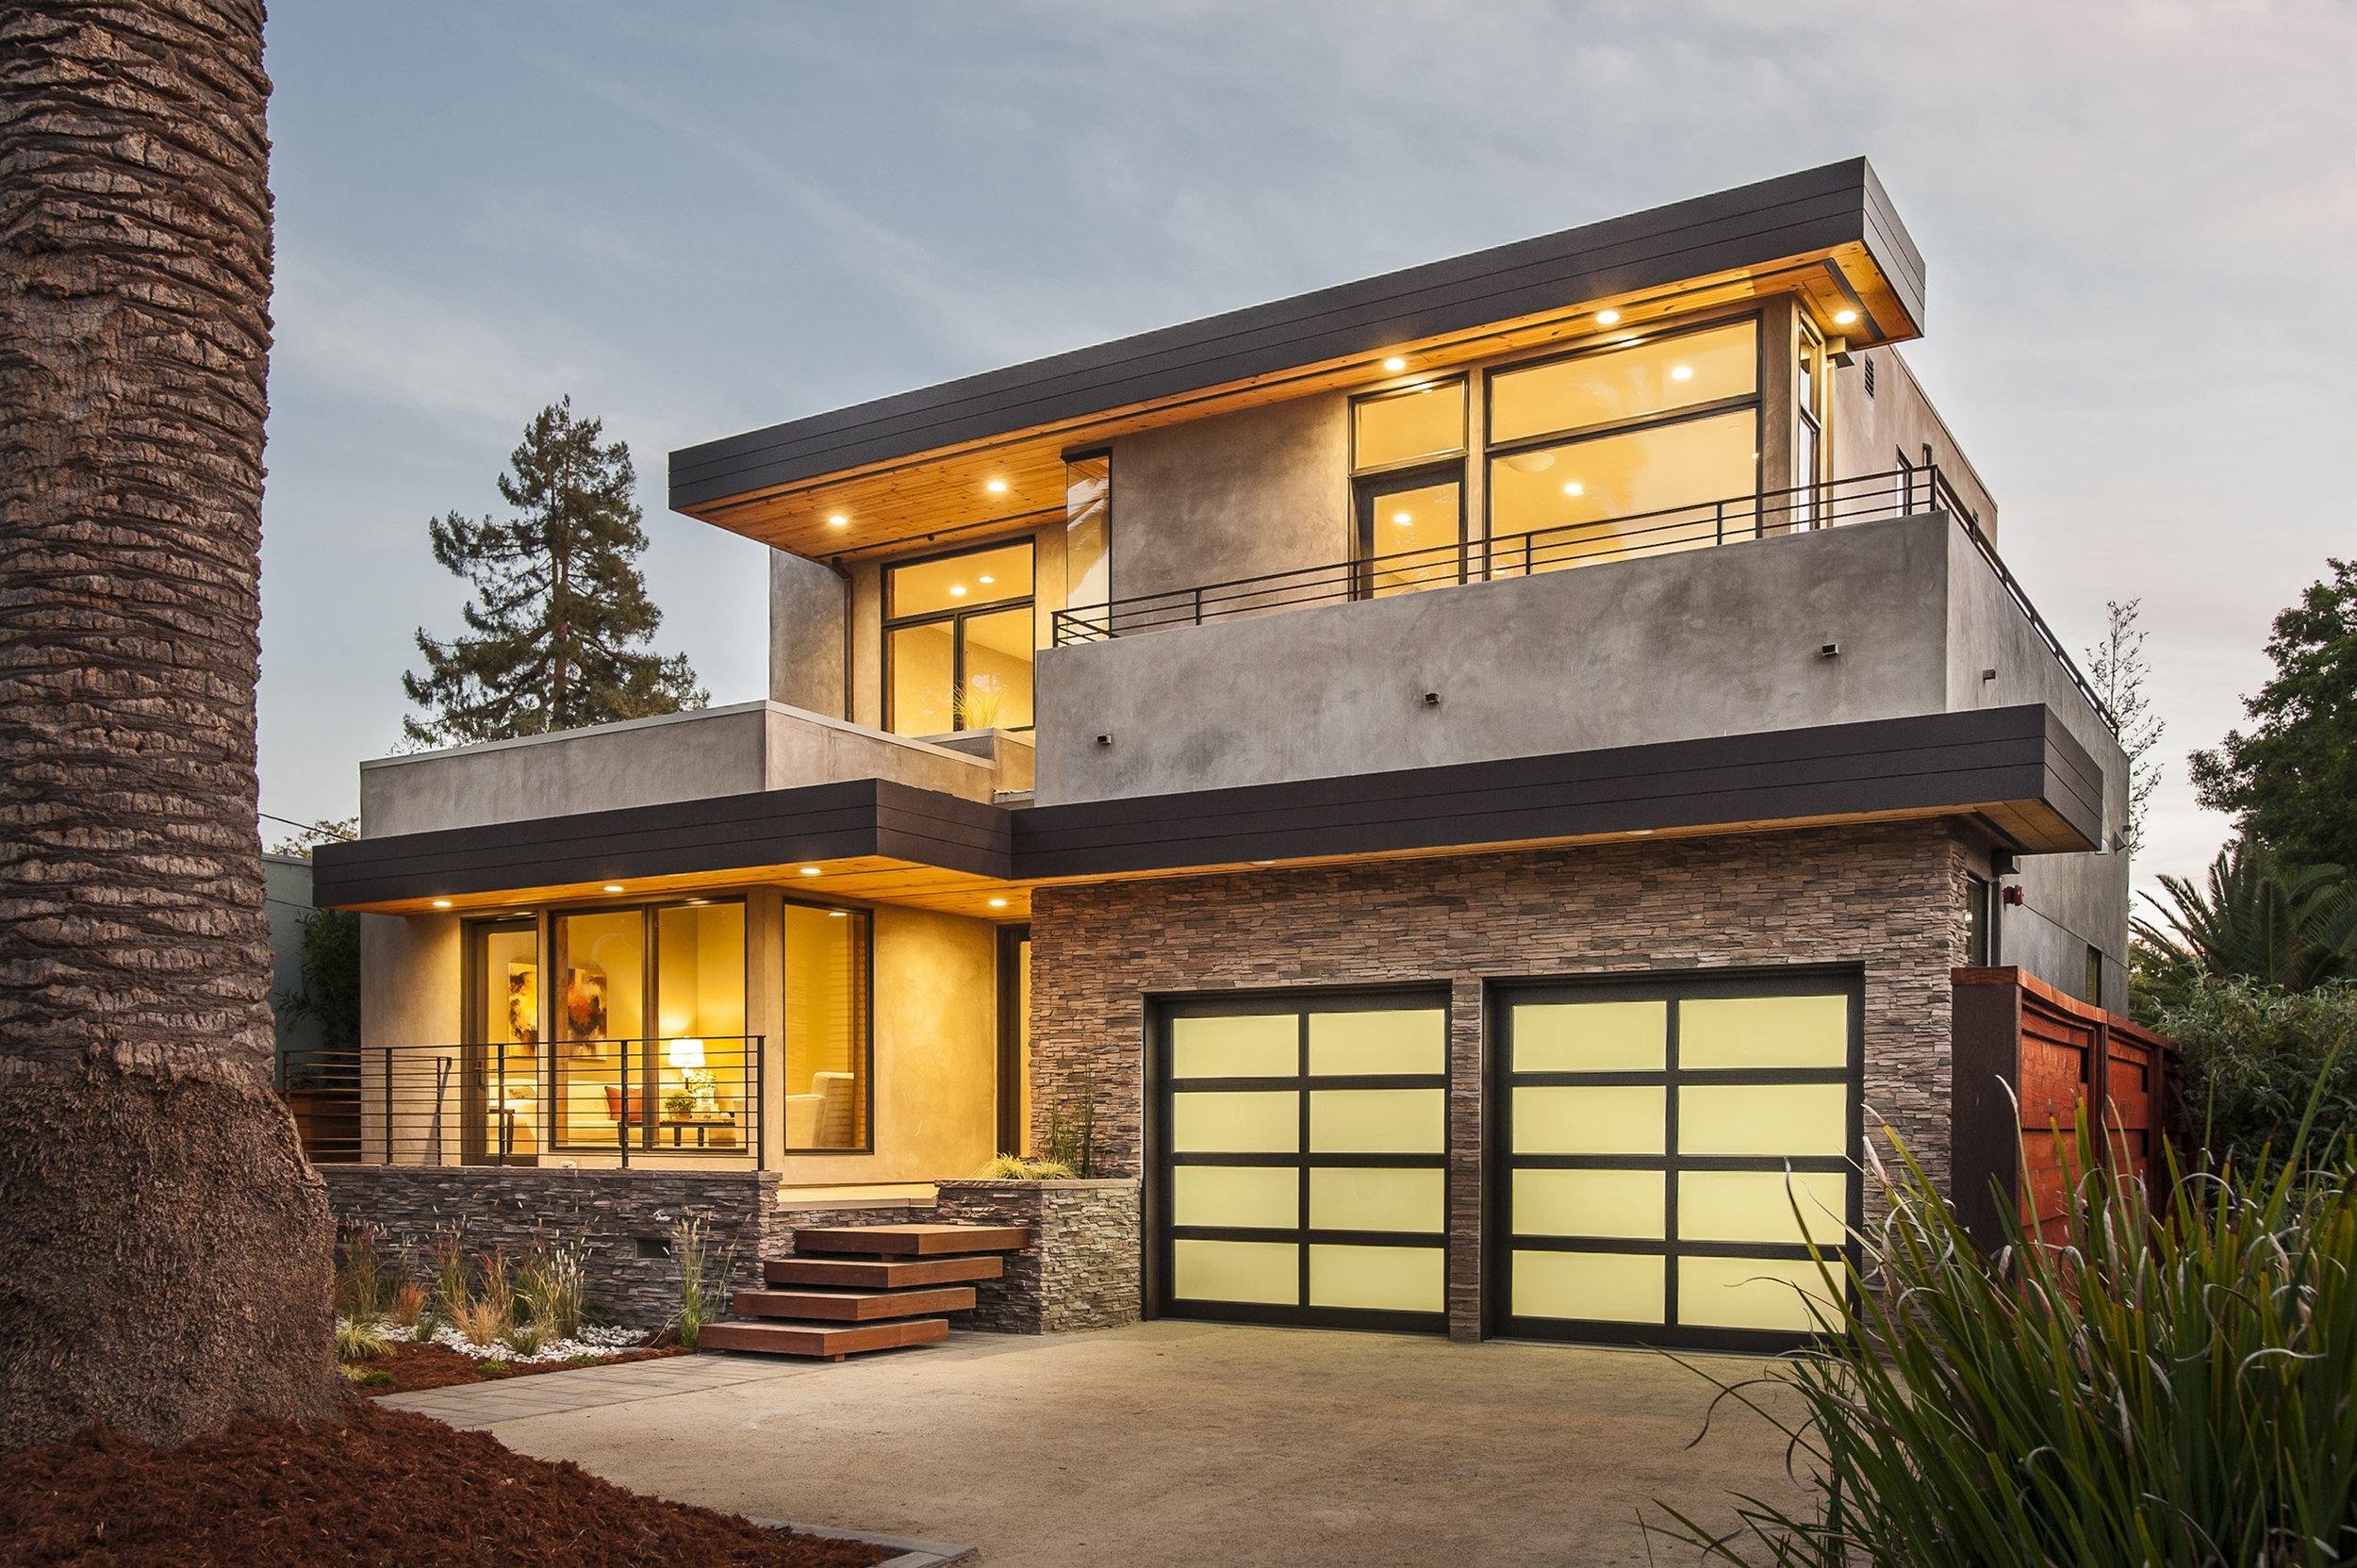 Best Kitchen Gallery: Ch X Tld of Modern Design Homes  on rachelxblog.com